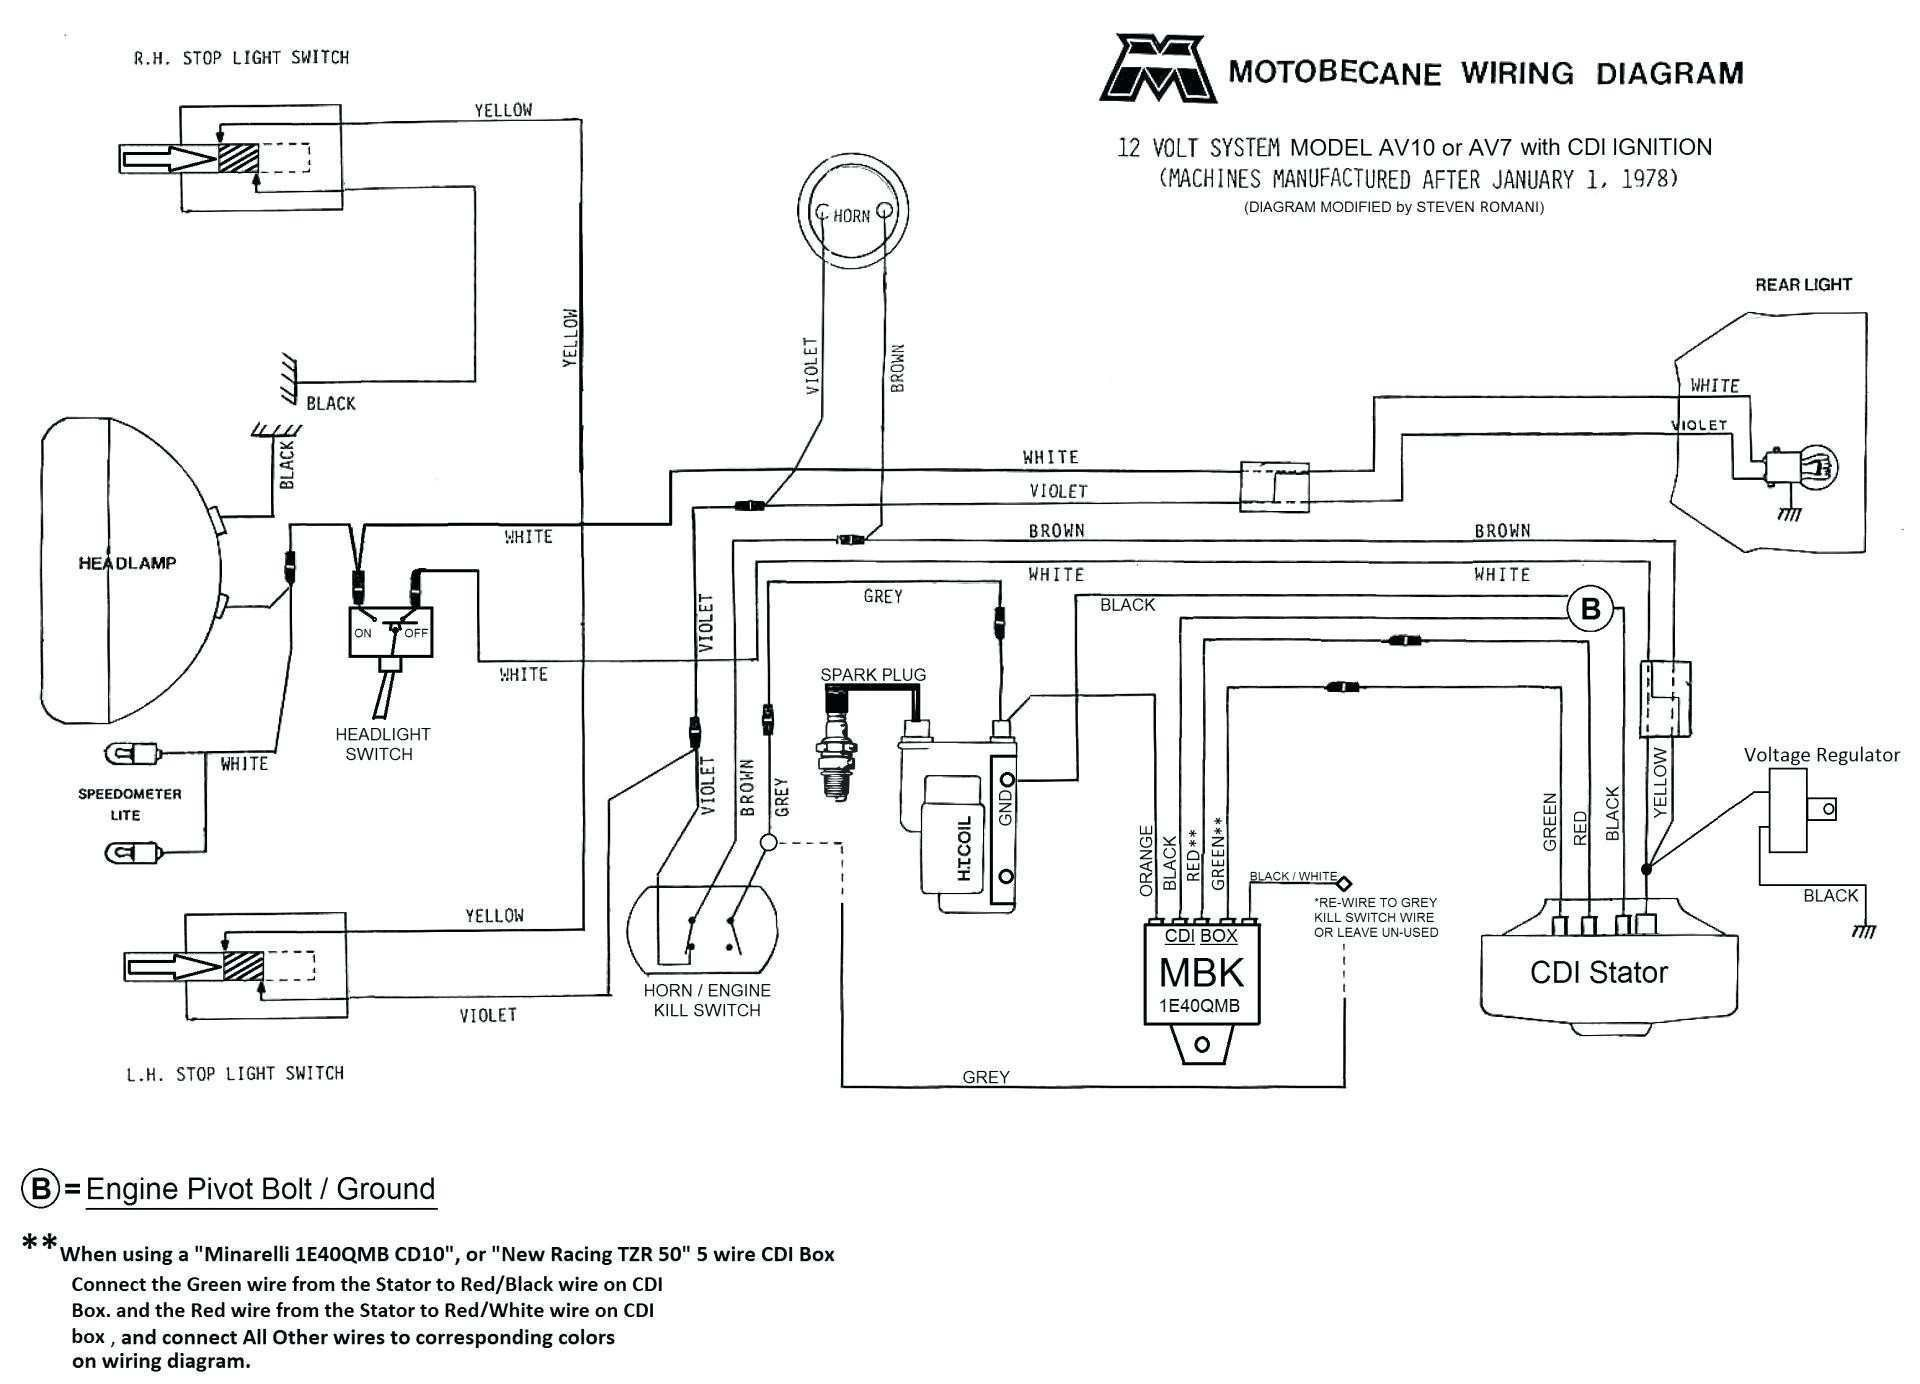 yamaha golf cars g9 gas wiring diagram g9 wiring diagram wiring diagram data  g9 wiring diagram wiring diagram data